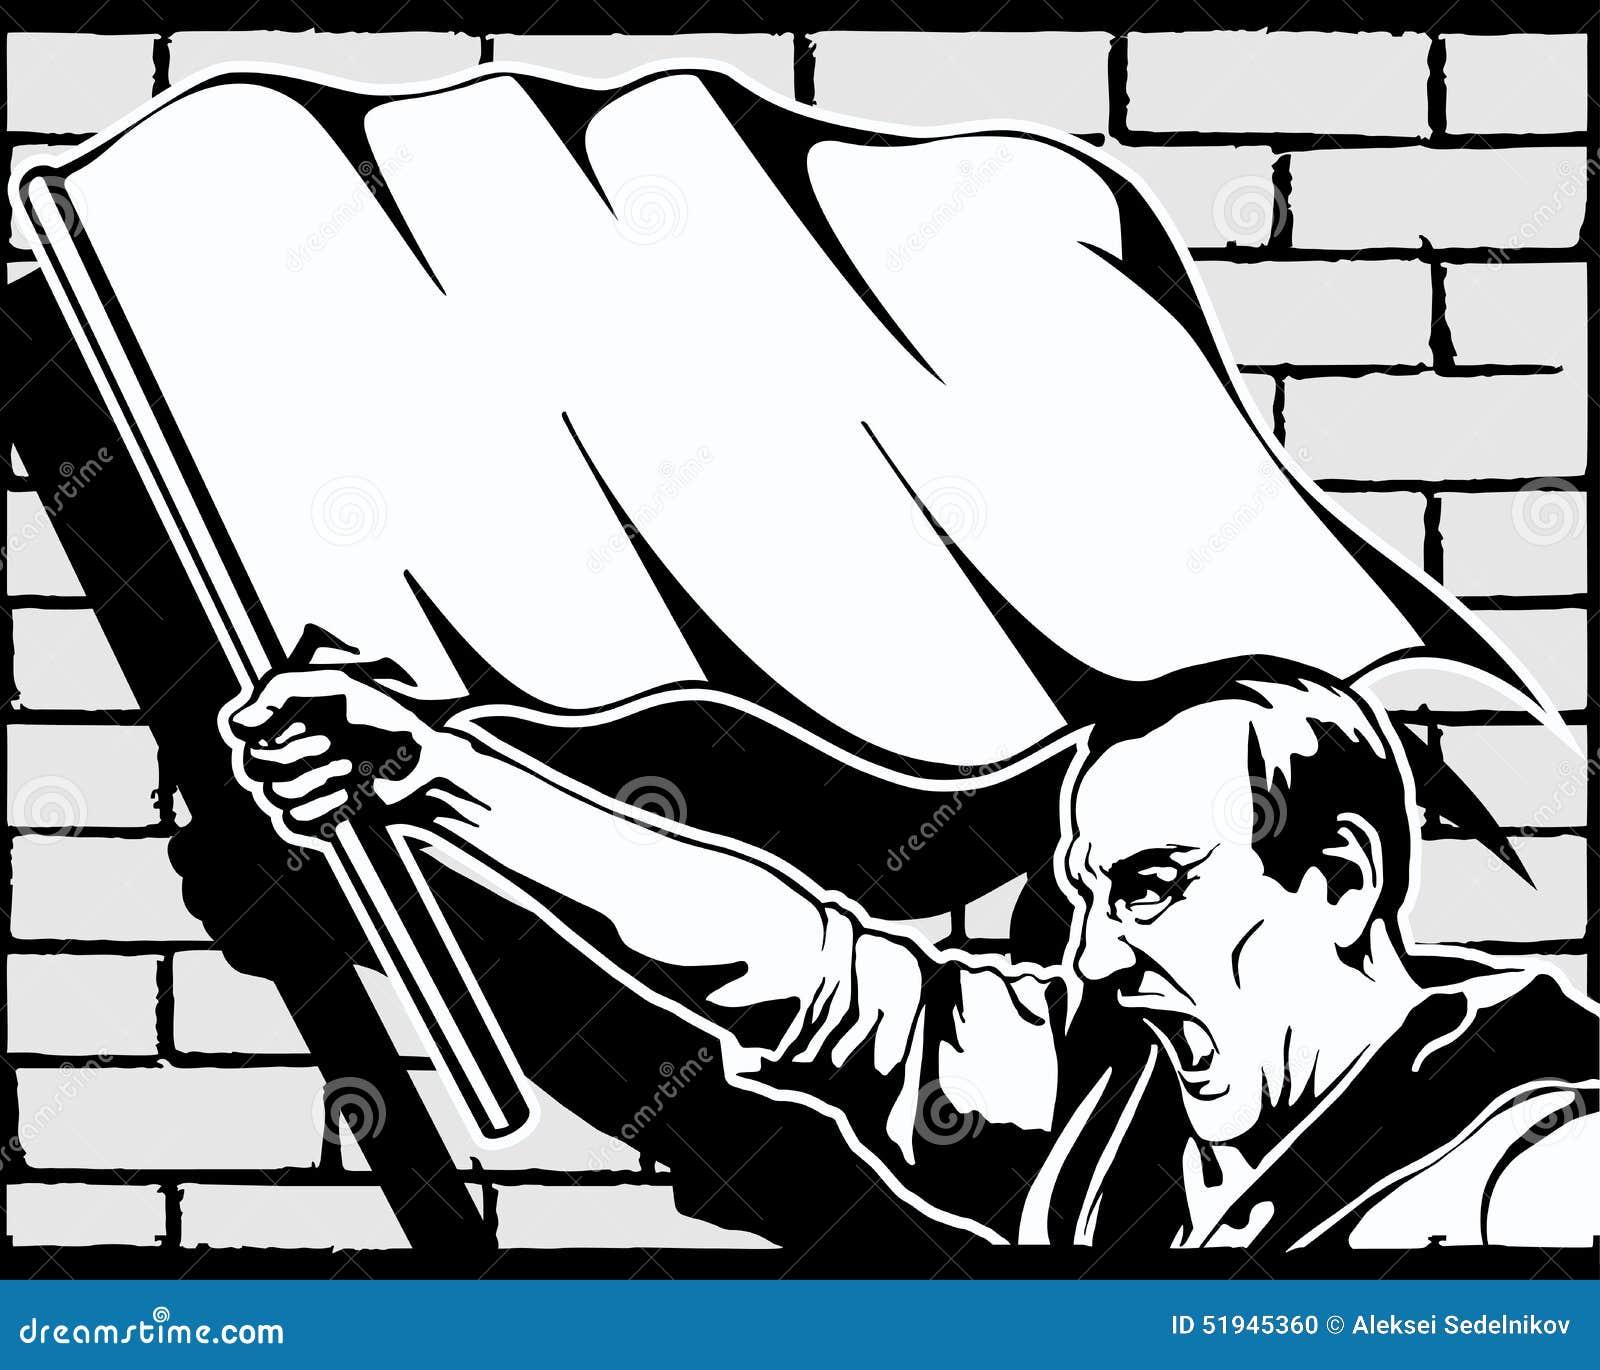 Fist Protest Strike Revolution Graffiti Vector Stock